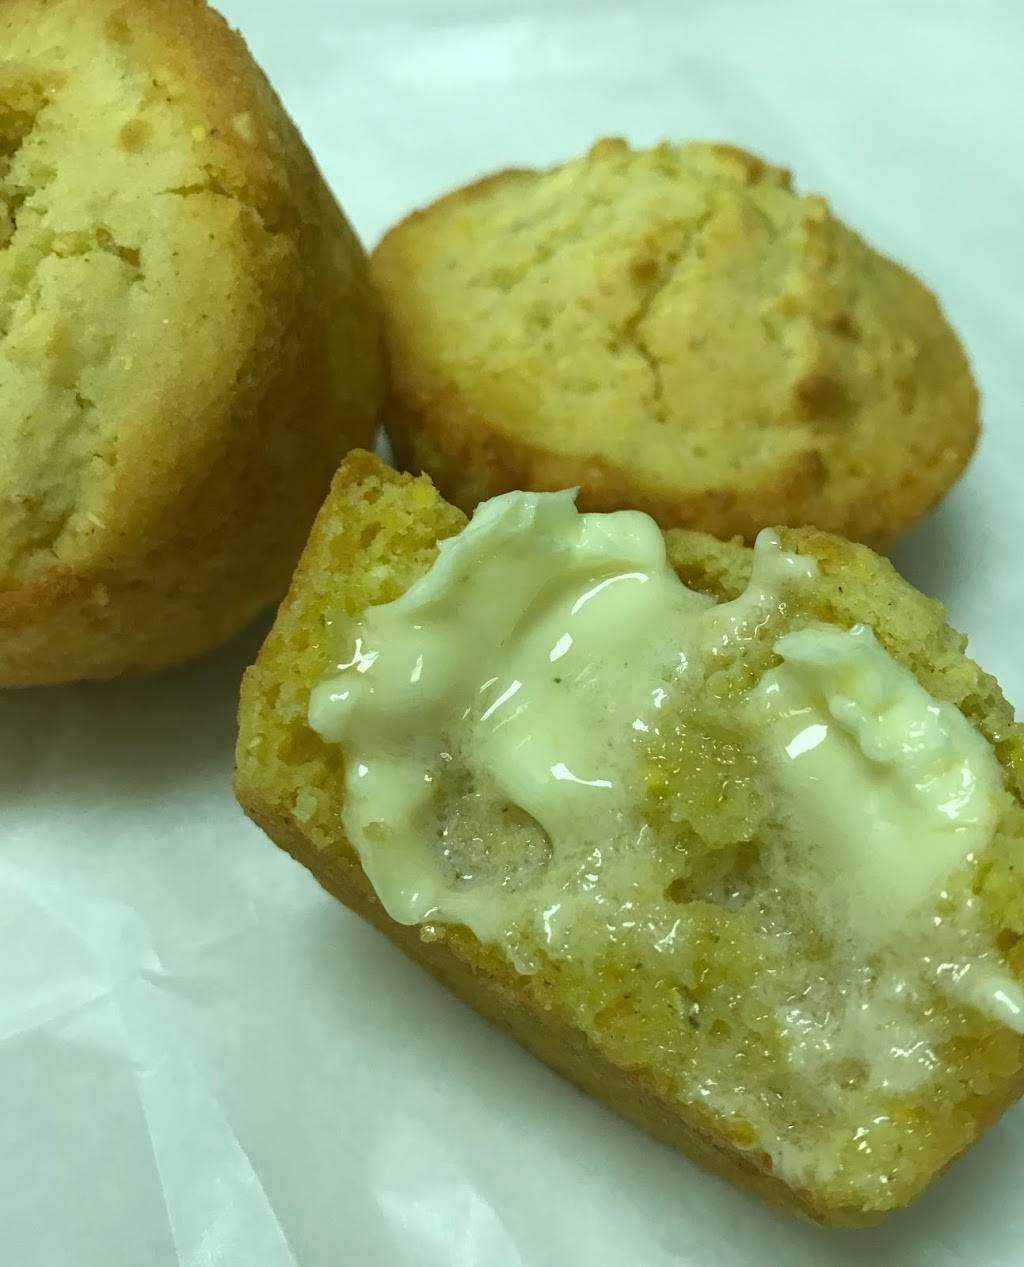 Bradley Bake Shop | bakery | 55 River Rd, Bogota, NJ 07603, USA | 2013430444 OR +1 201-343-0444